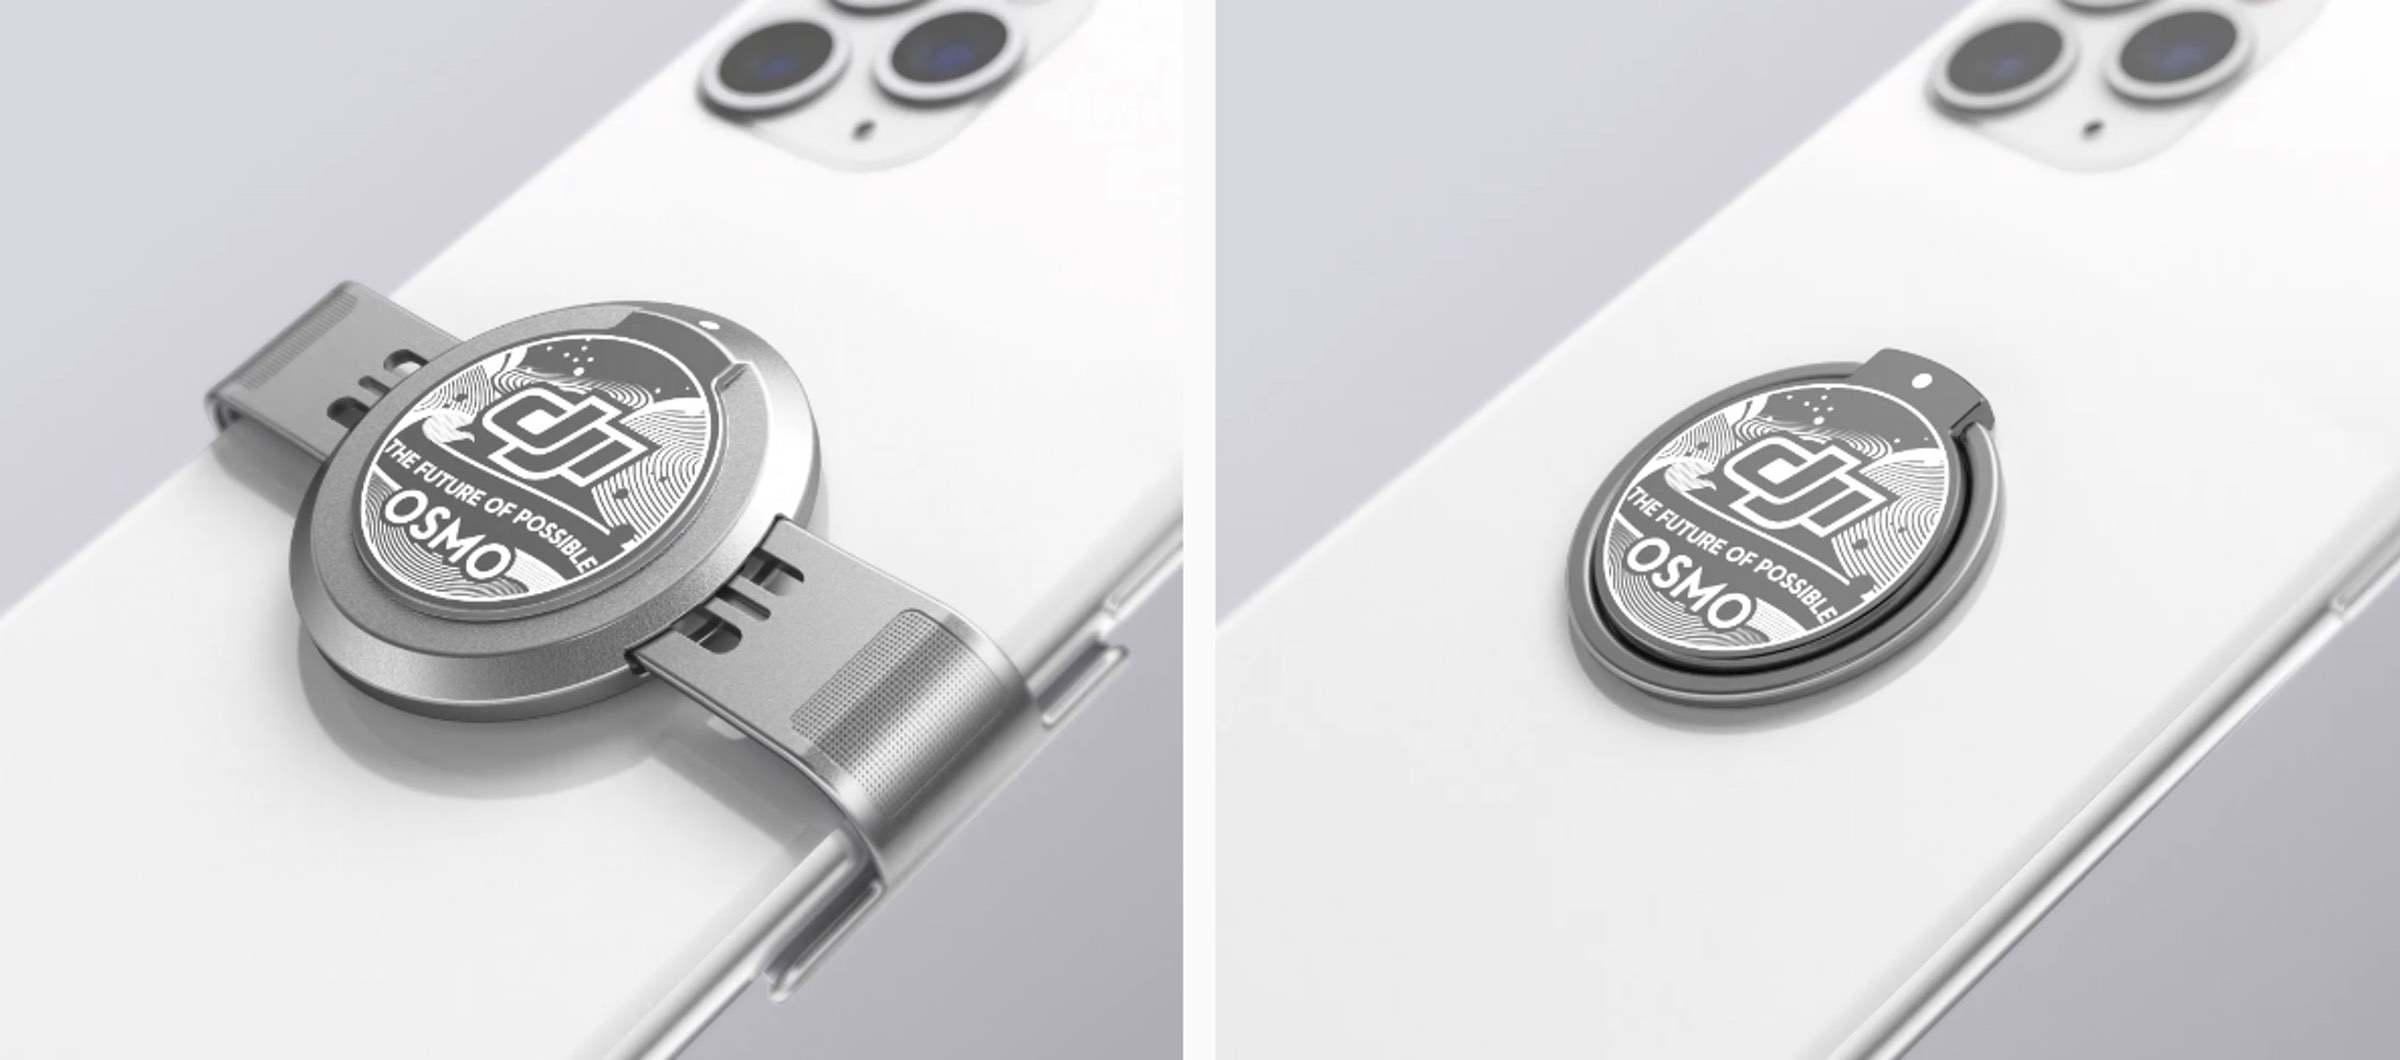 DJI Osmo Mobile 4 - Magnetische Klemme oder Magnetringhalter